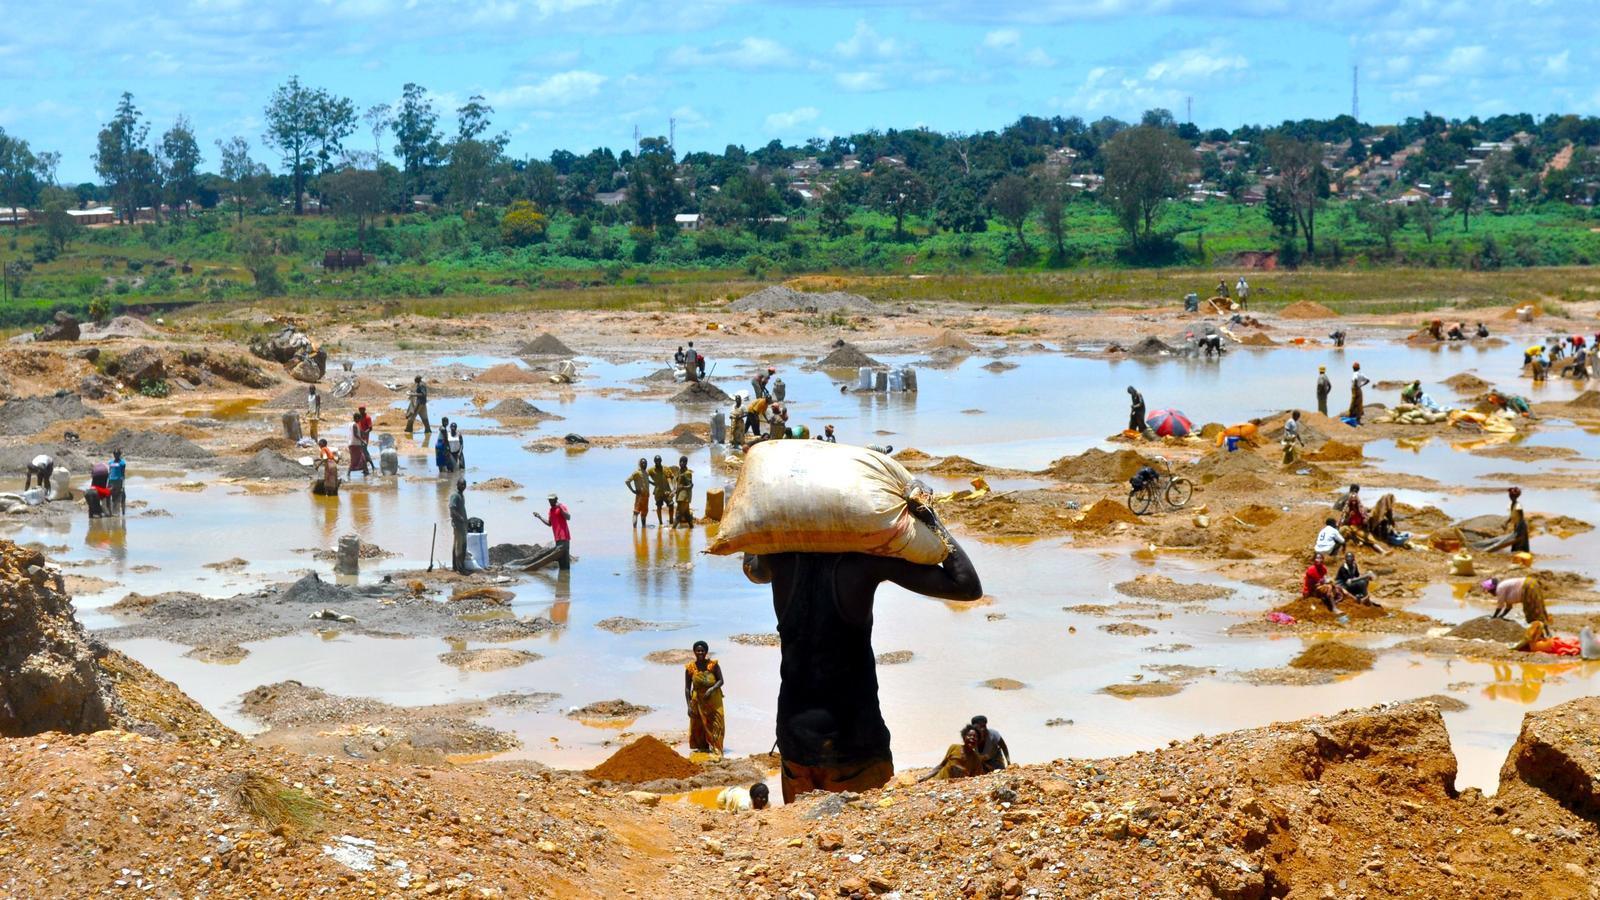 Netejant el coure al Congo